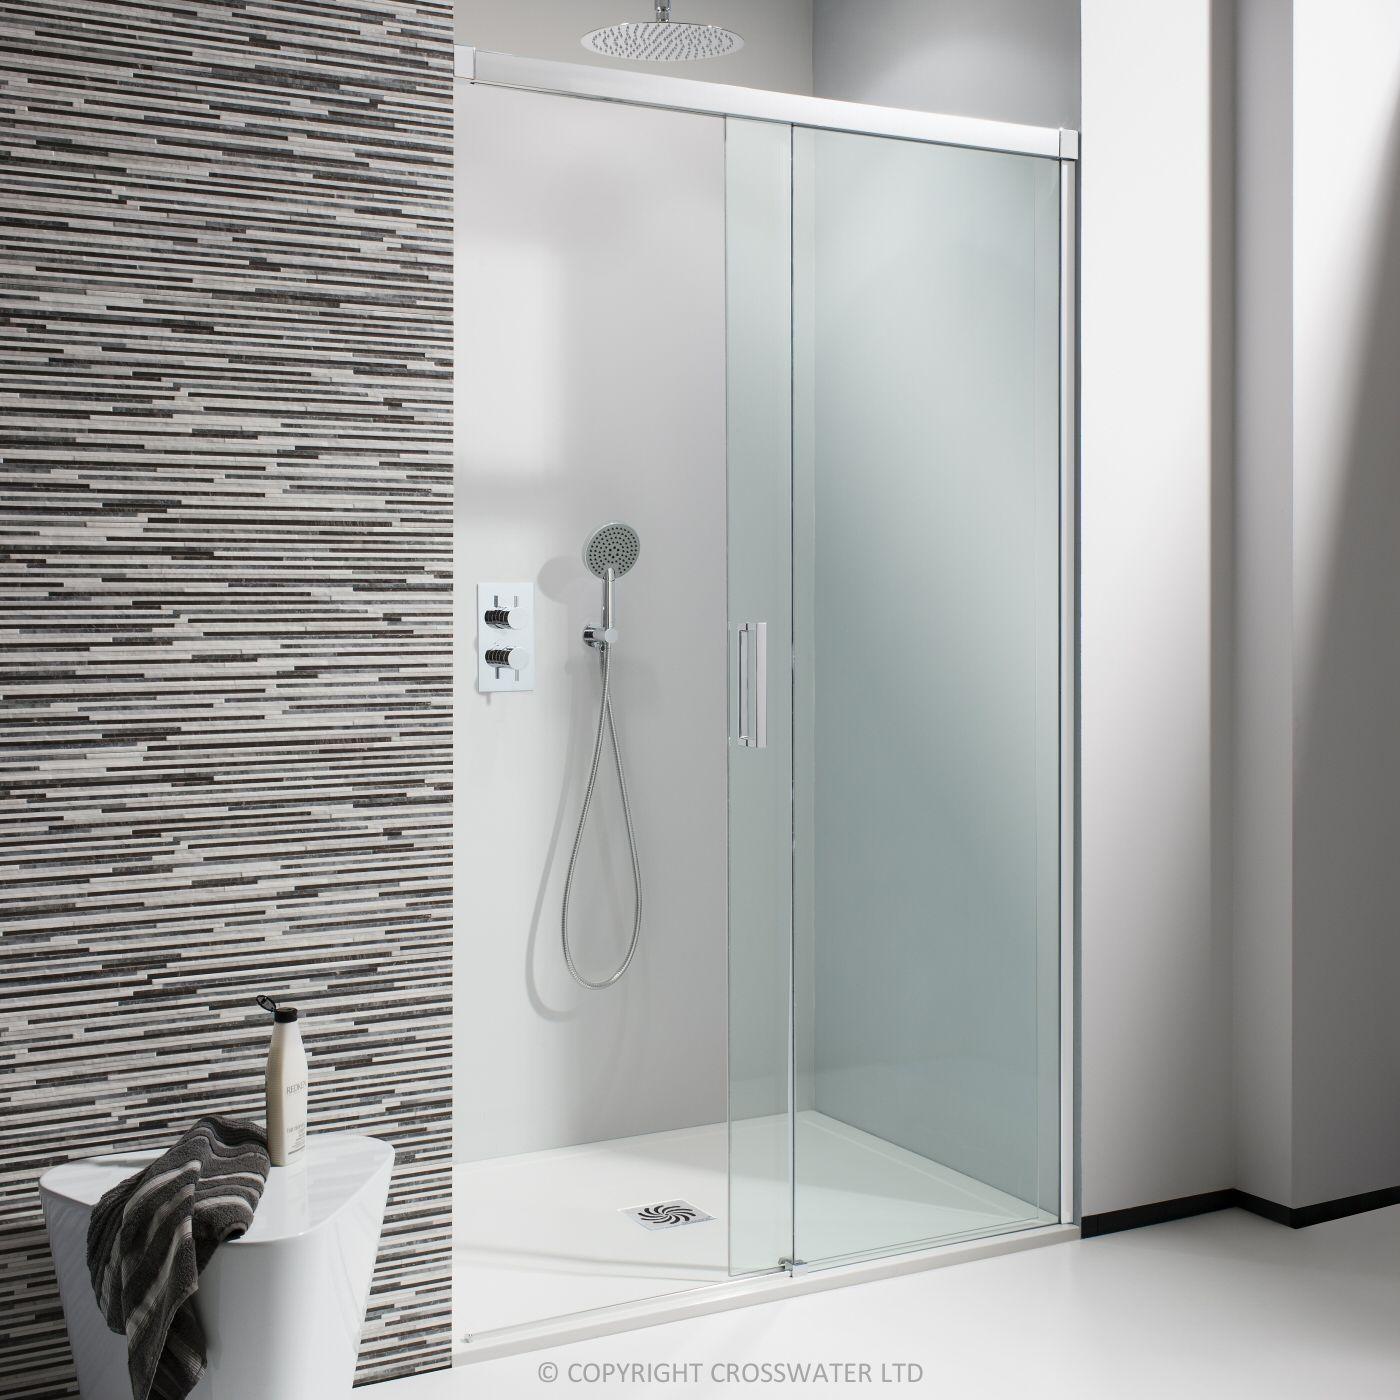 Simpsons 1200mm Design Semi Frameless Soft Close Slider Sliding Shower Door Shower Doors Shower Enclosure